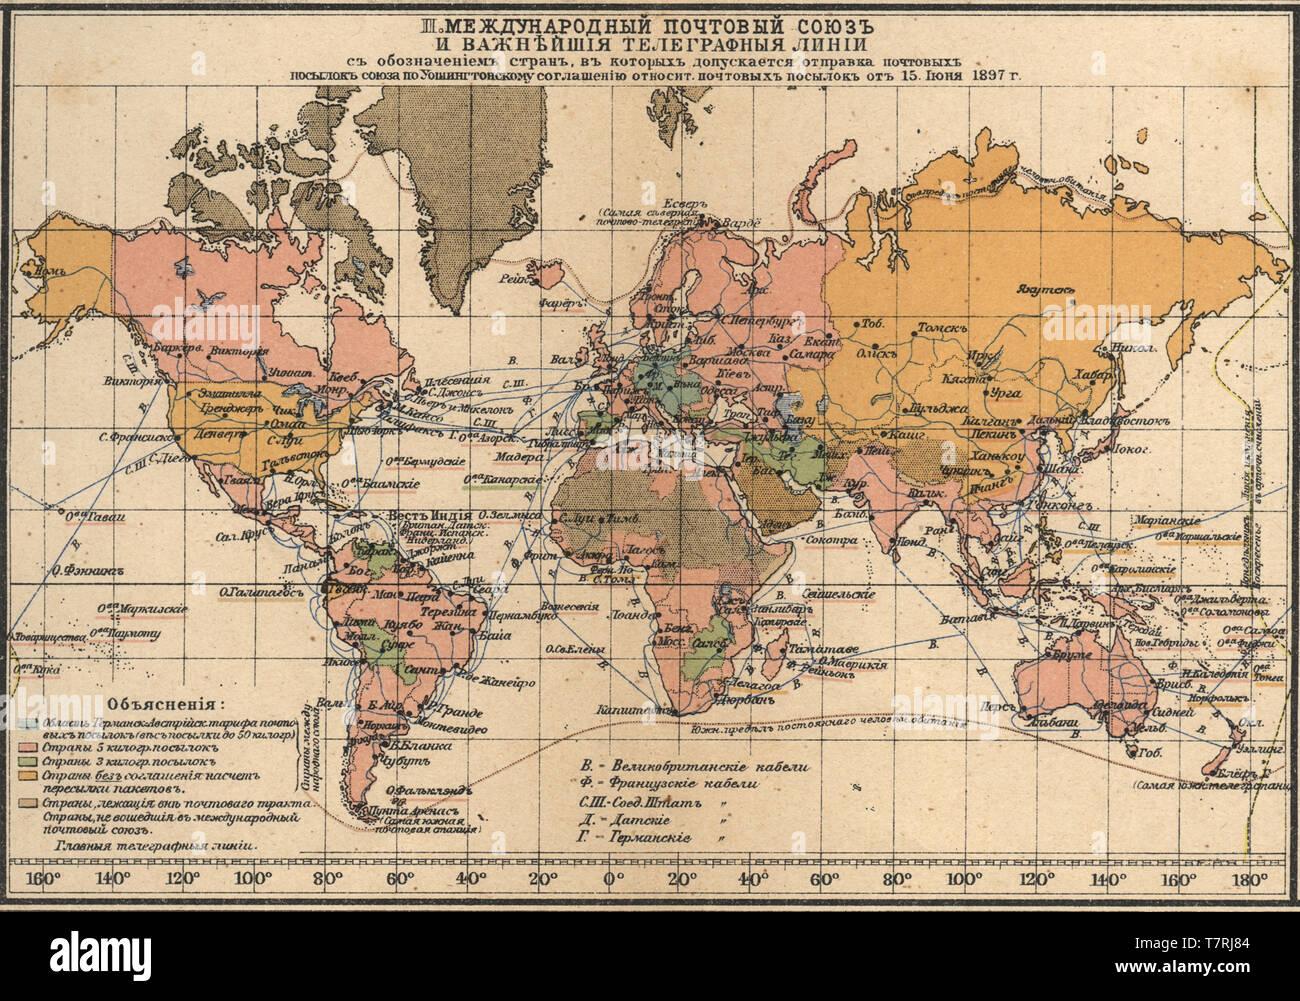 Picture of: World Map Longitude Latitude Lines Fotos E Imagenes De Stock Alamy